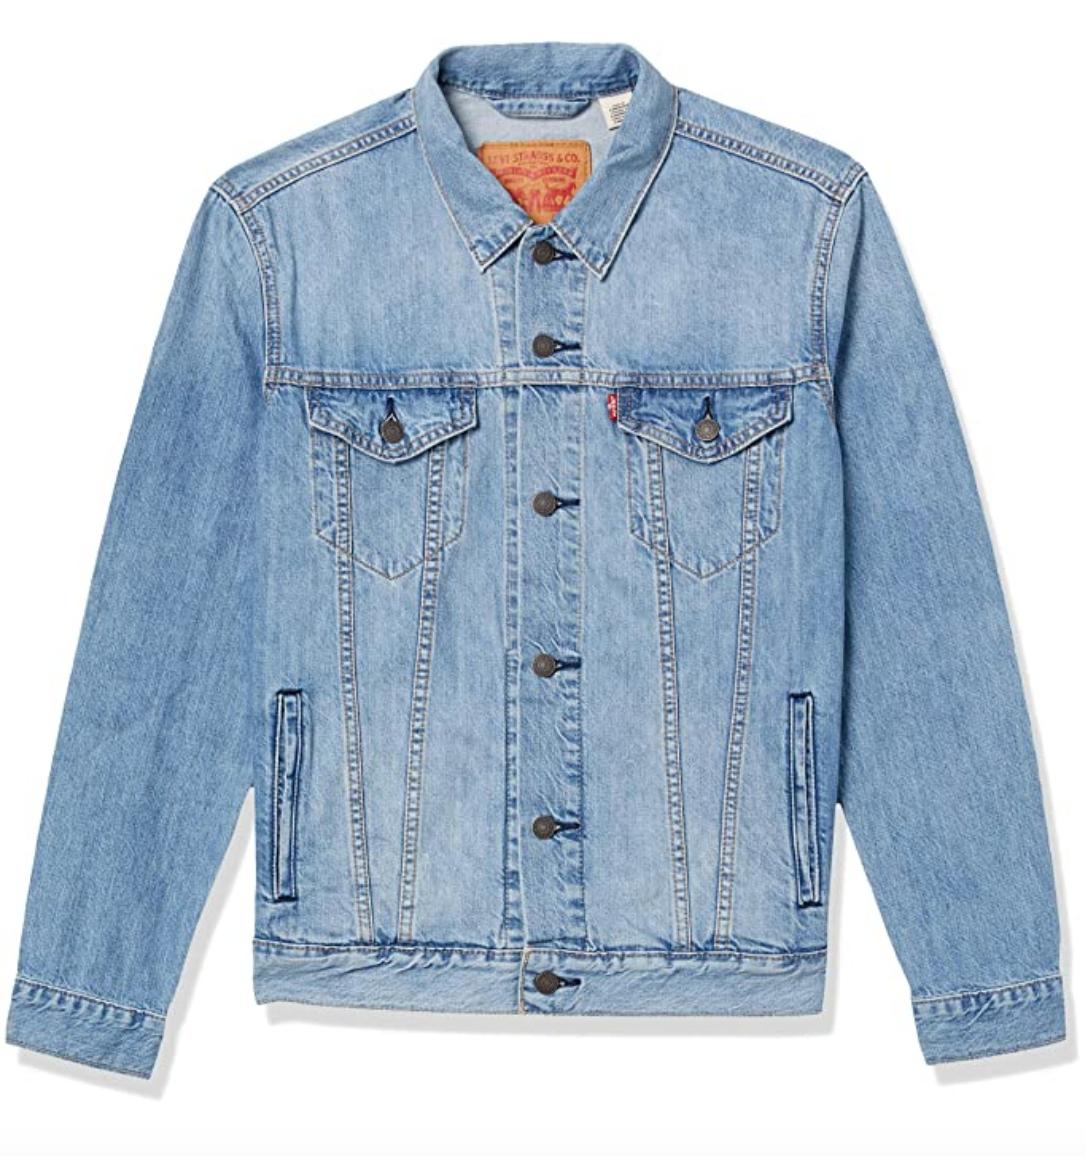 blue jean jacket levi's